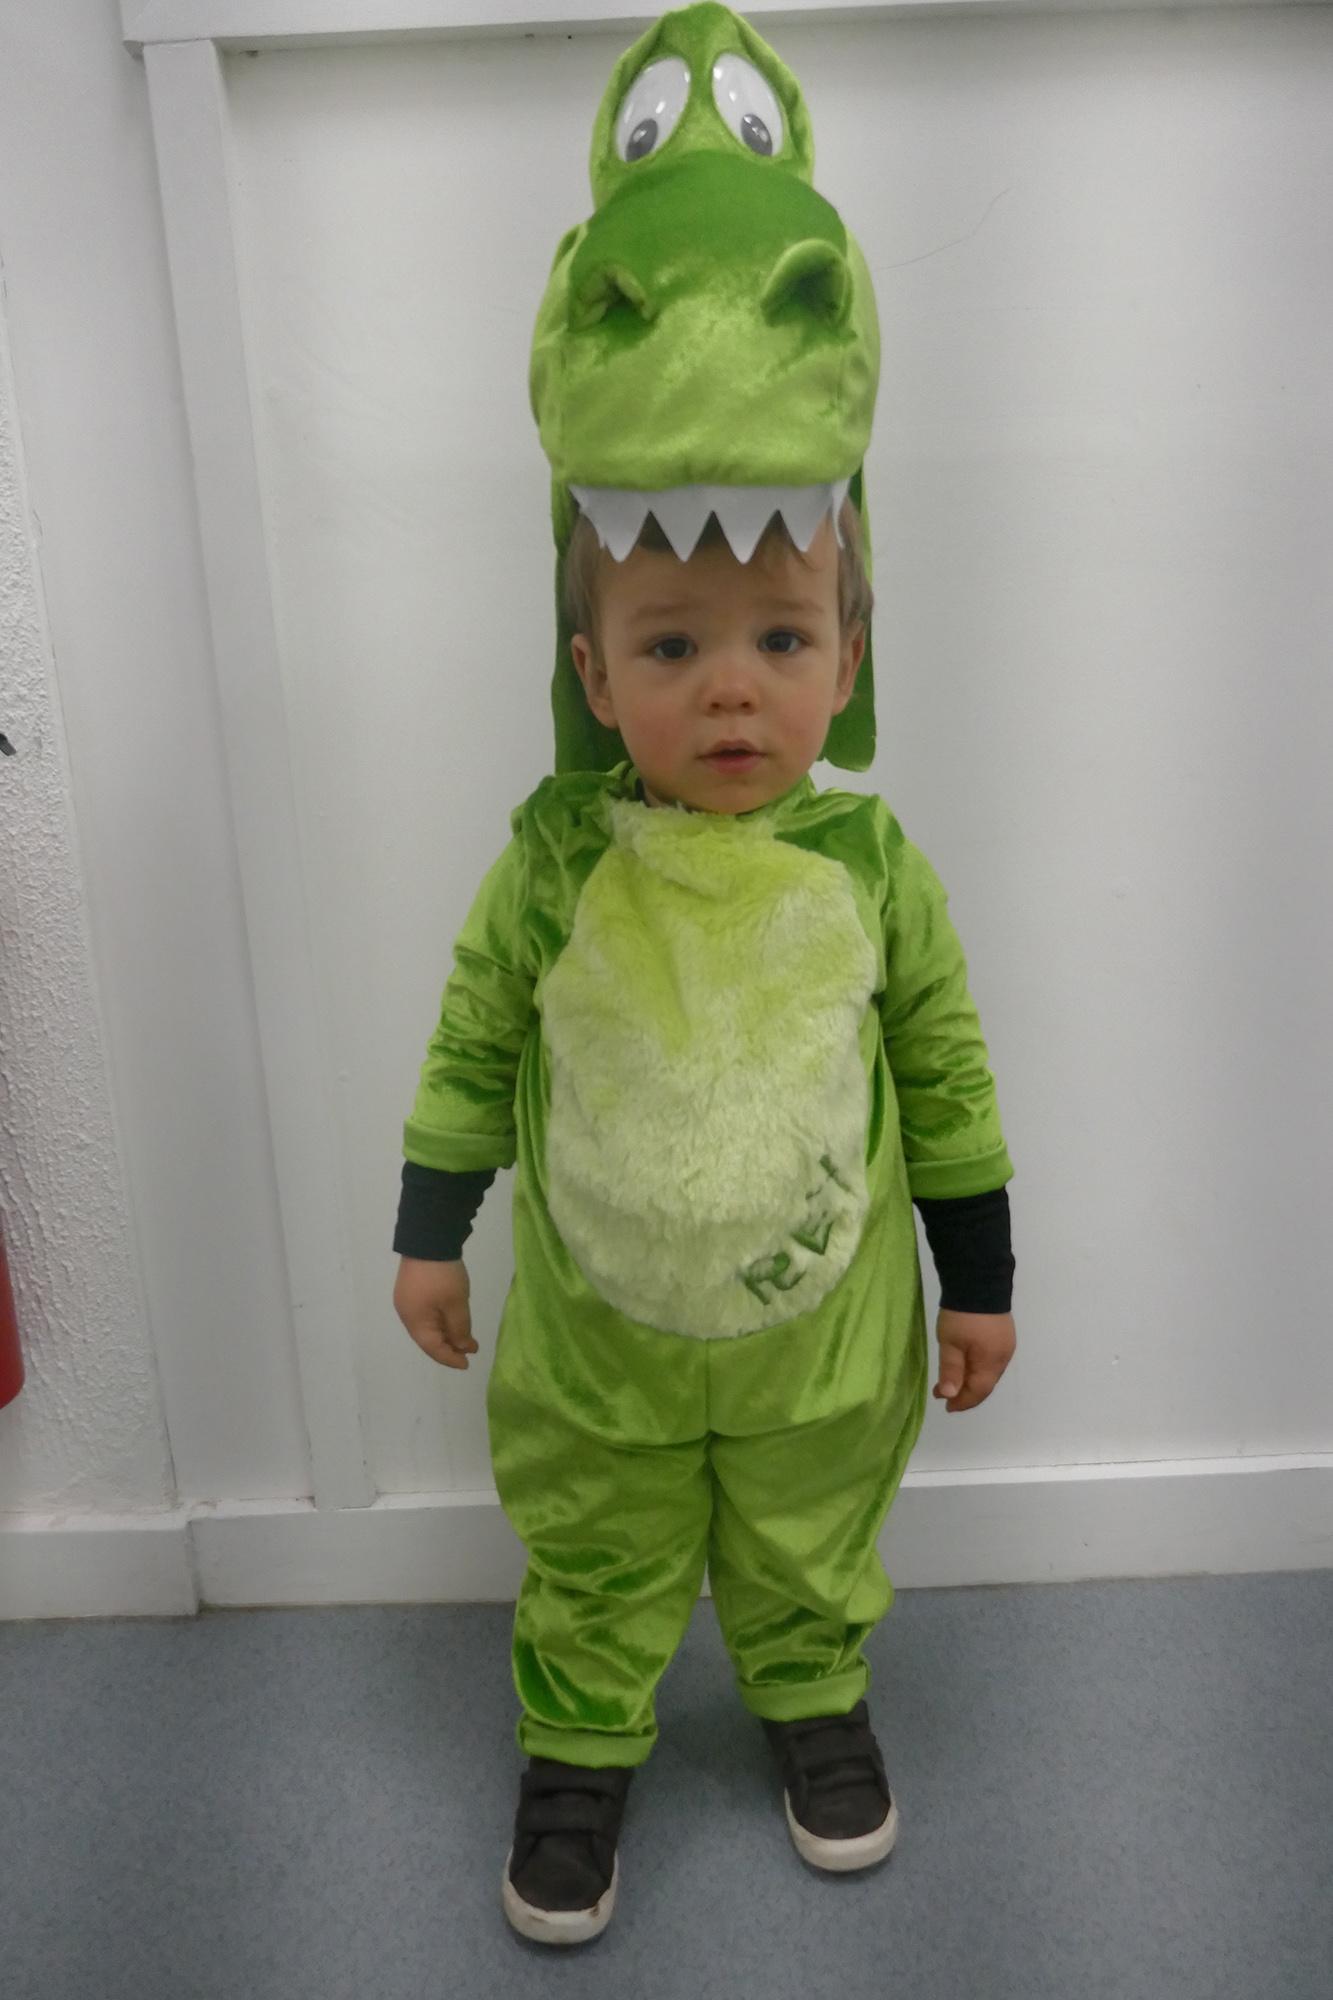 Child dressed as a Dinosaur